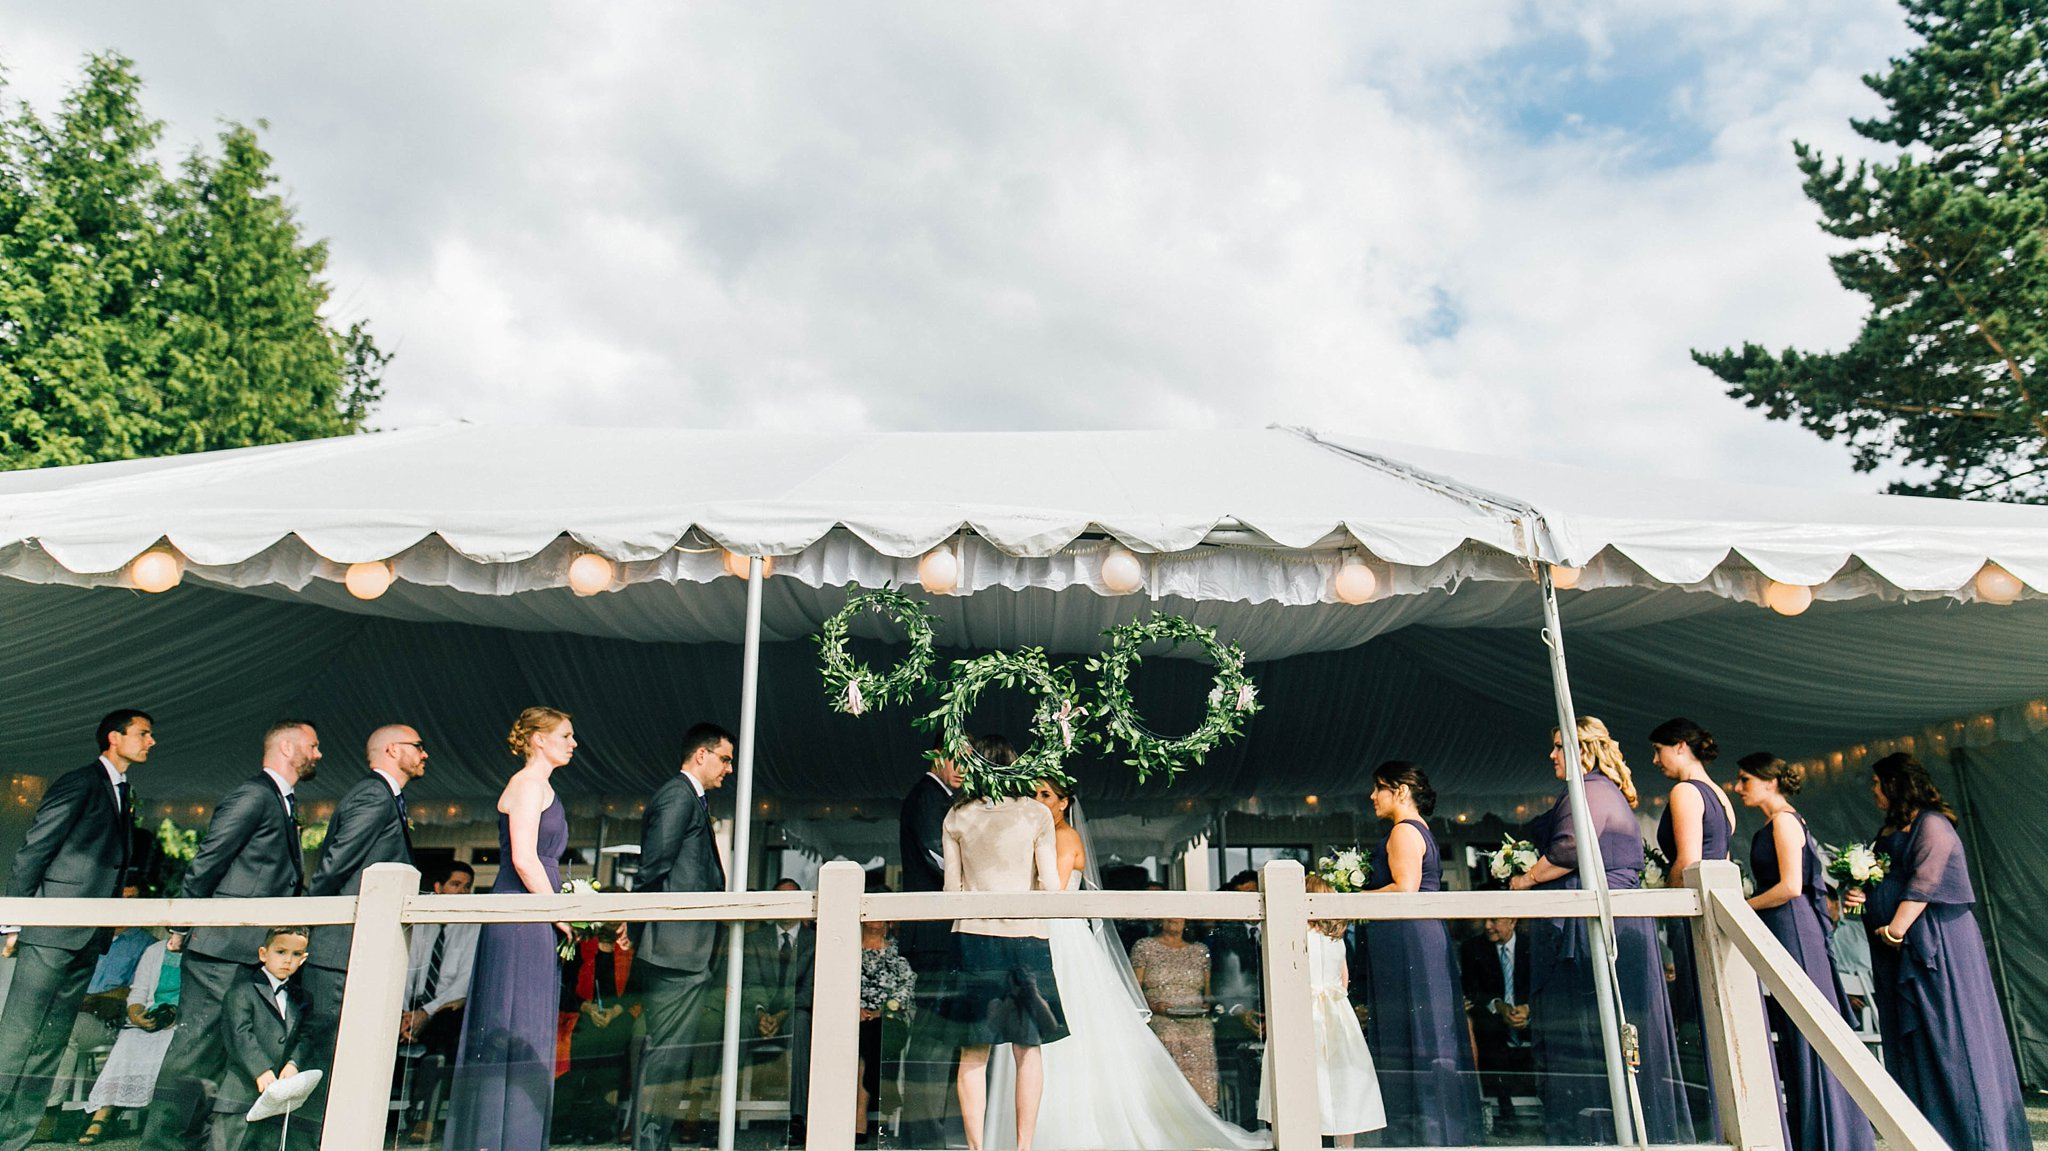 ashley_vos_seattle_wedding_photographer_096.jpg